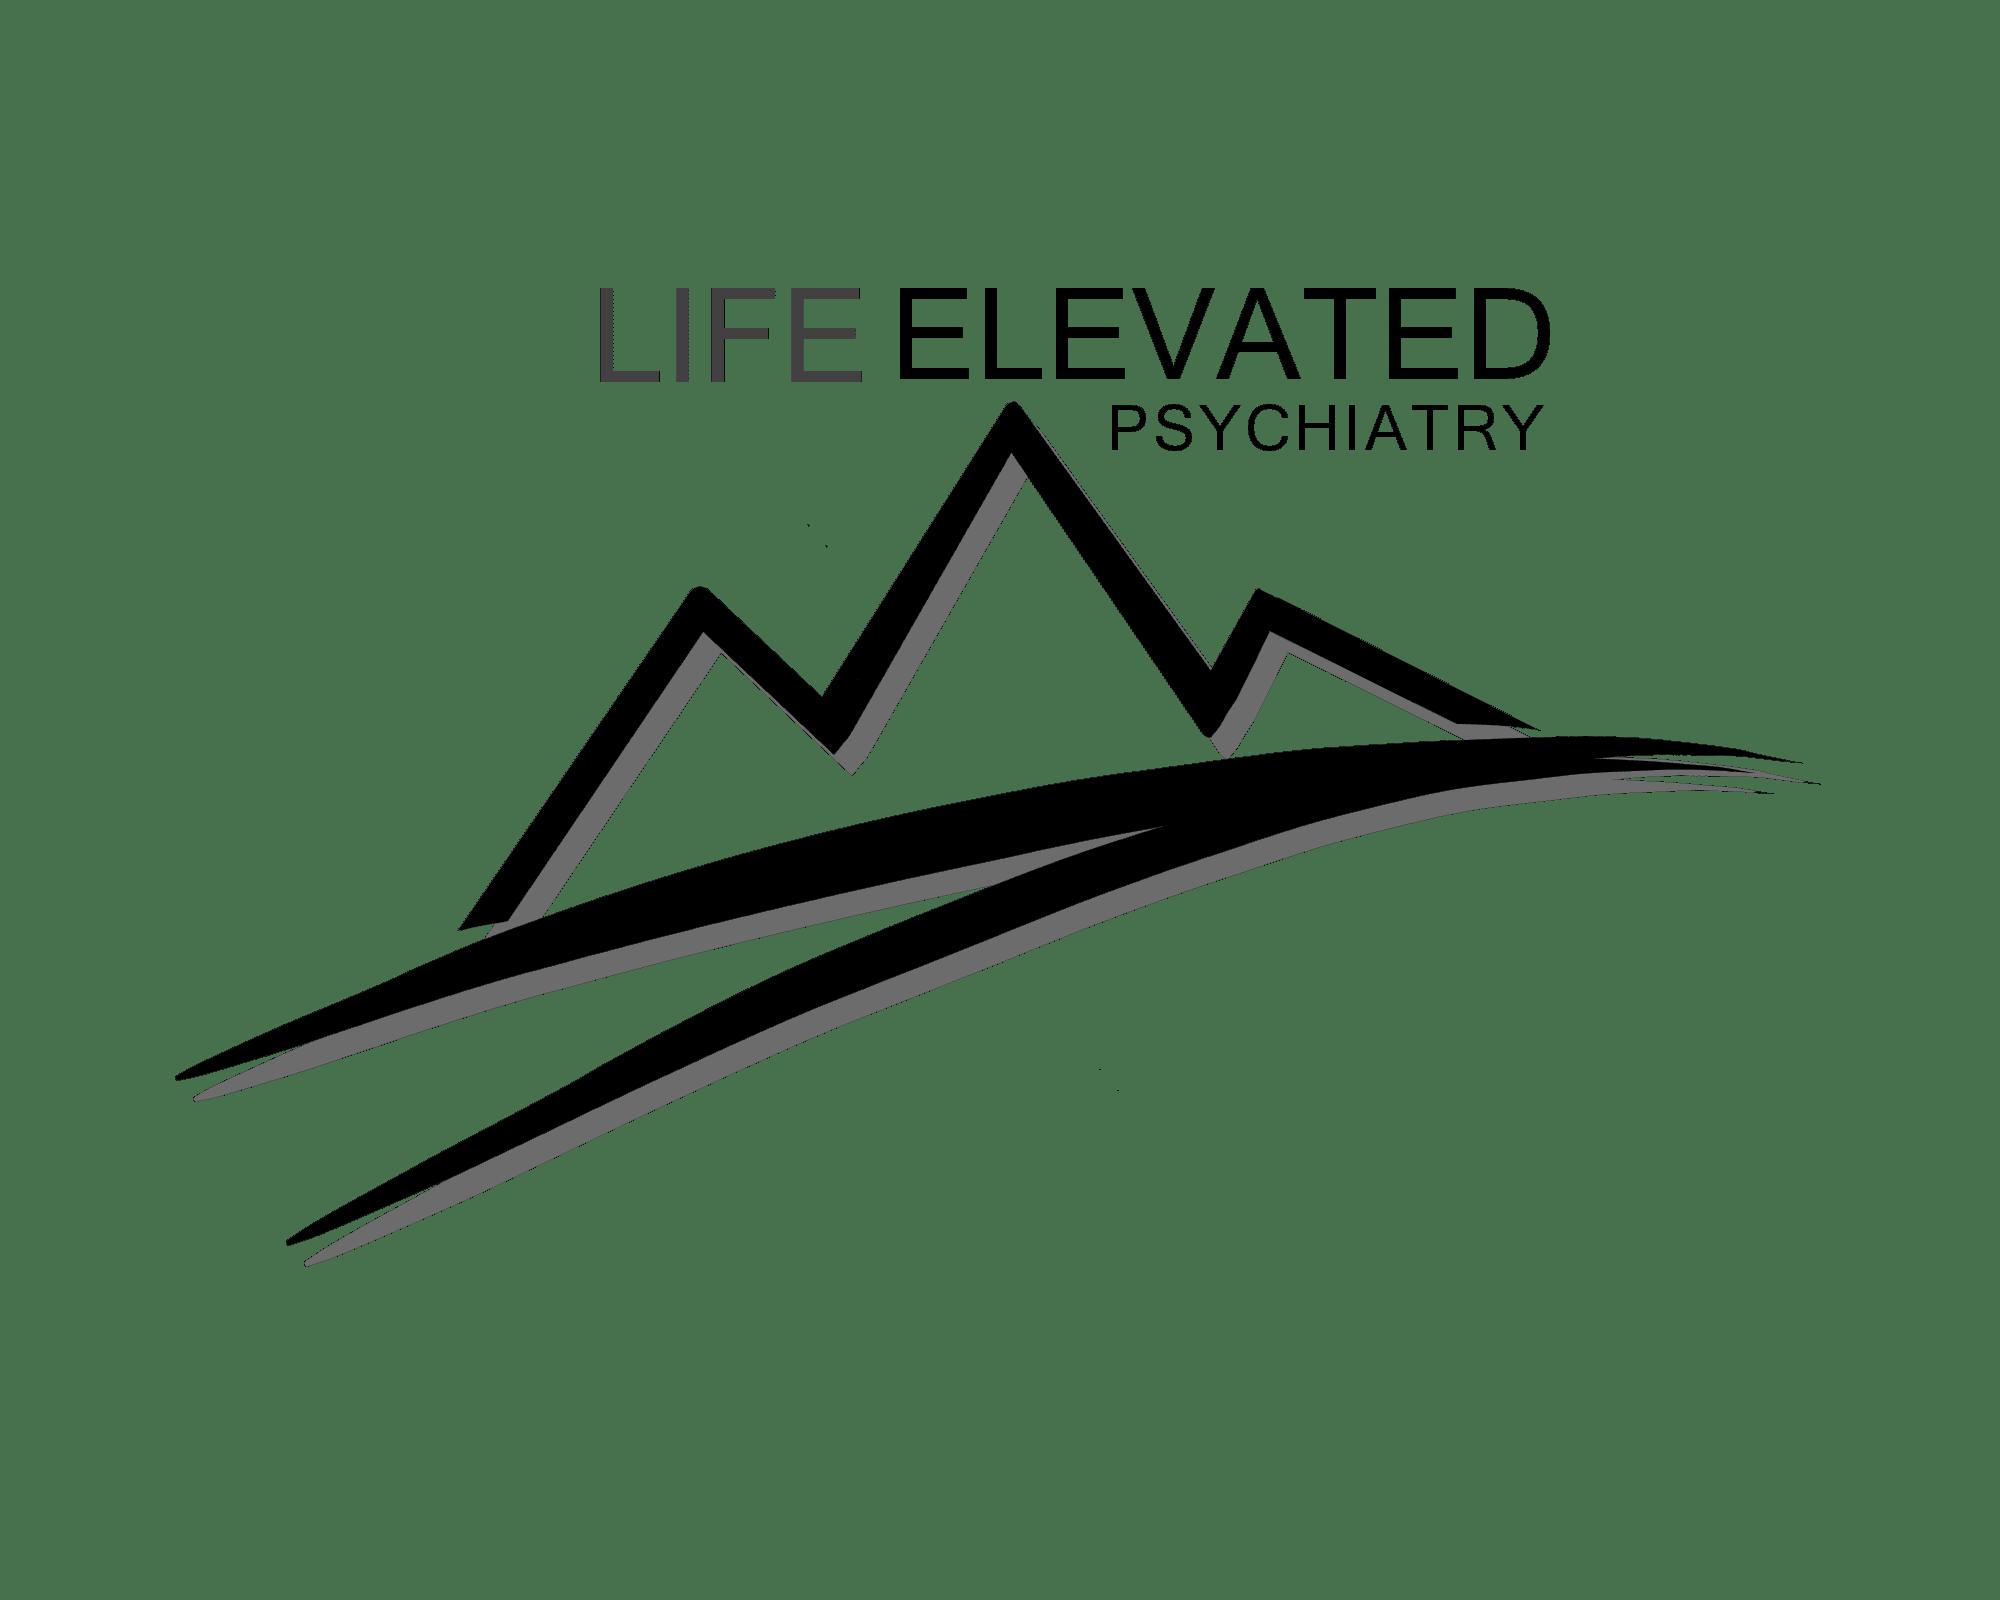 Life elevated Psychiatry